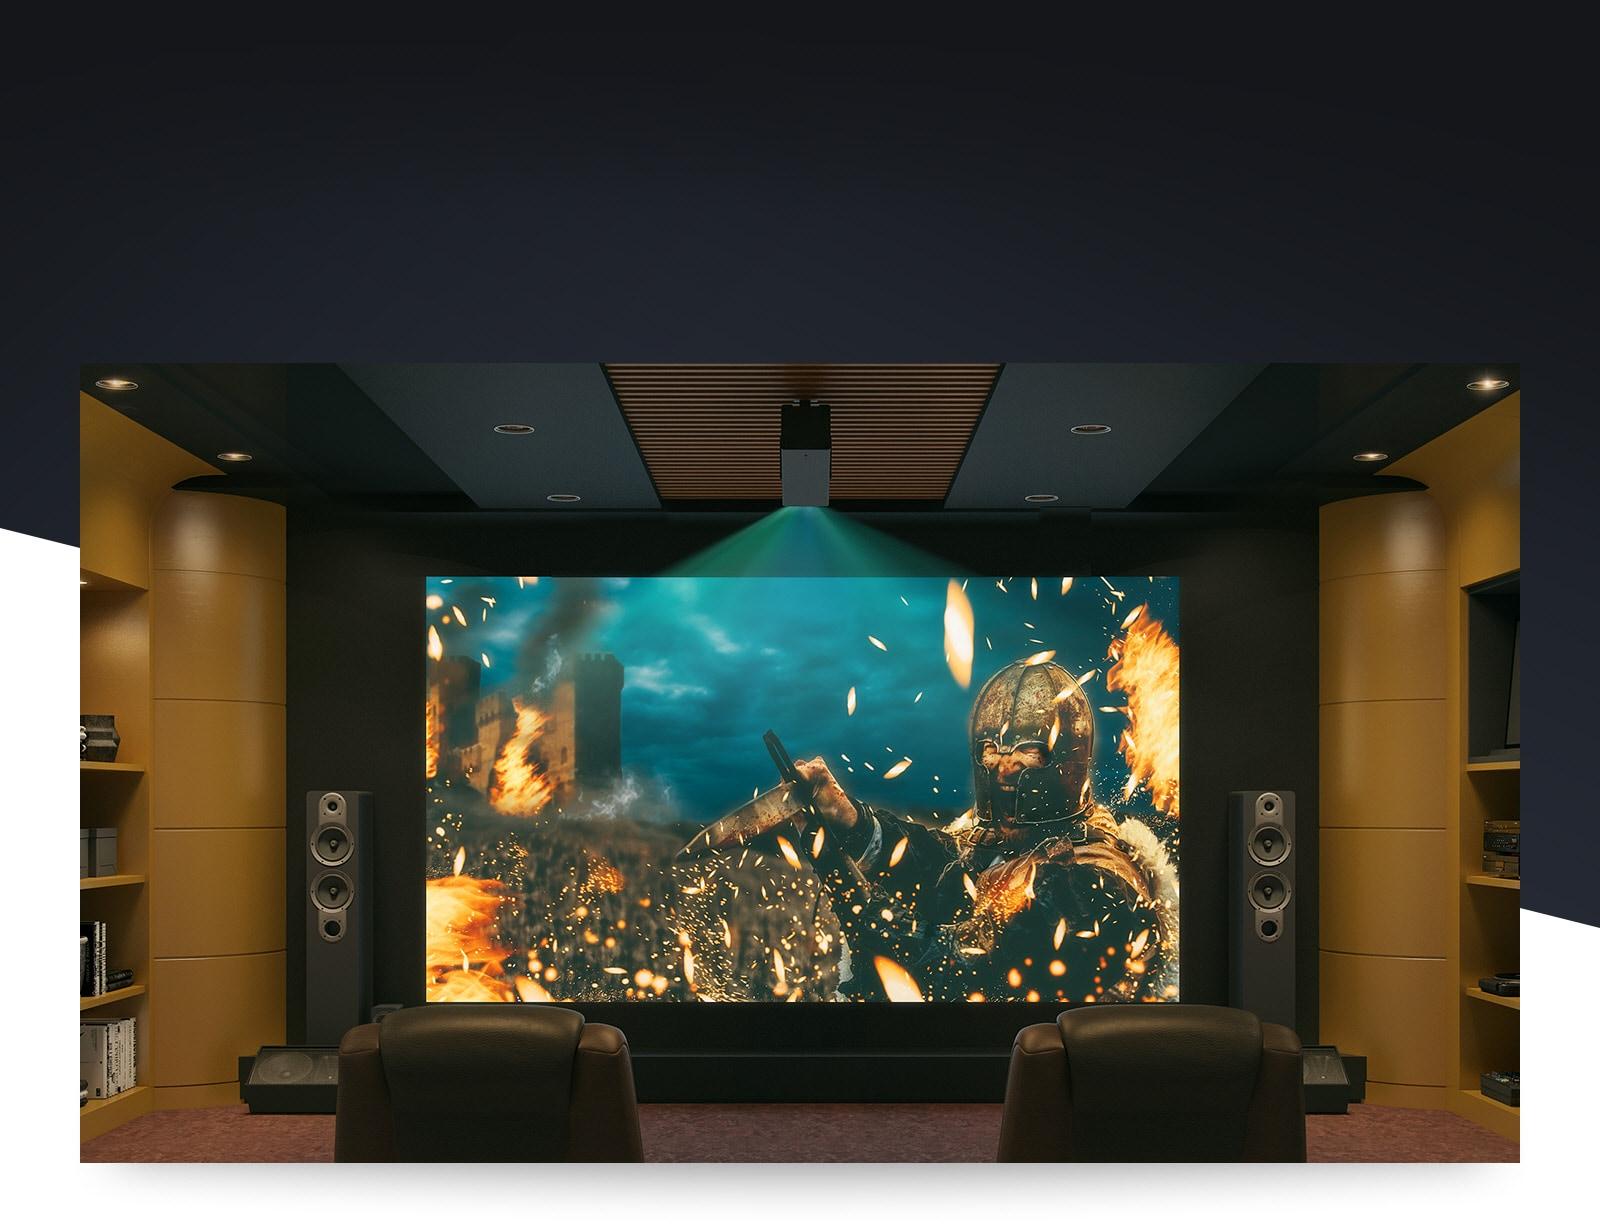 LG 4K UHD Laser Cinebeam